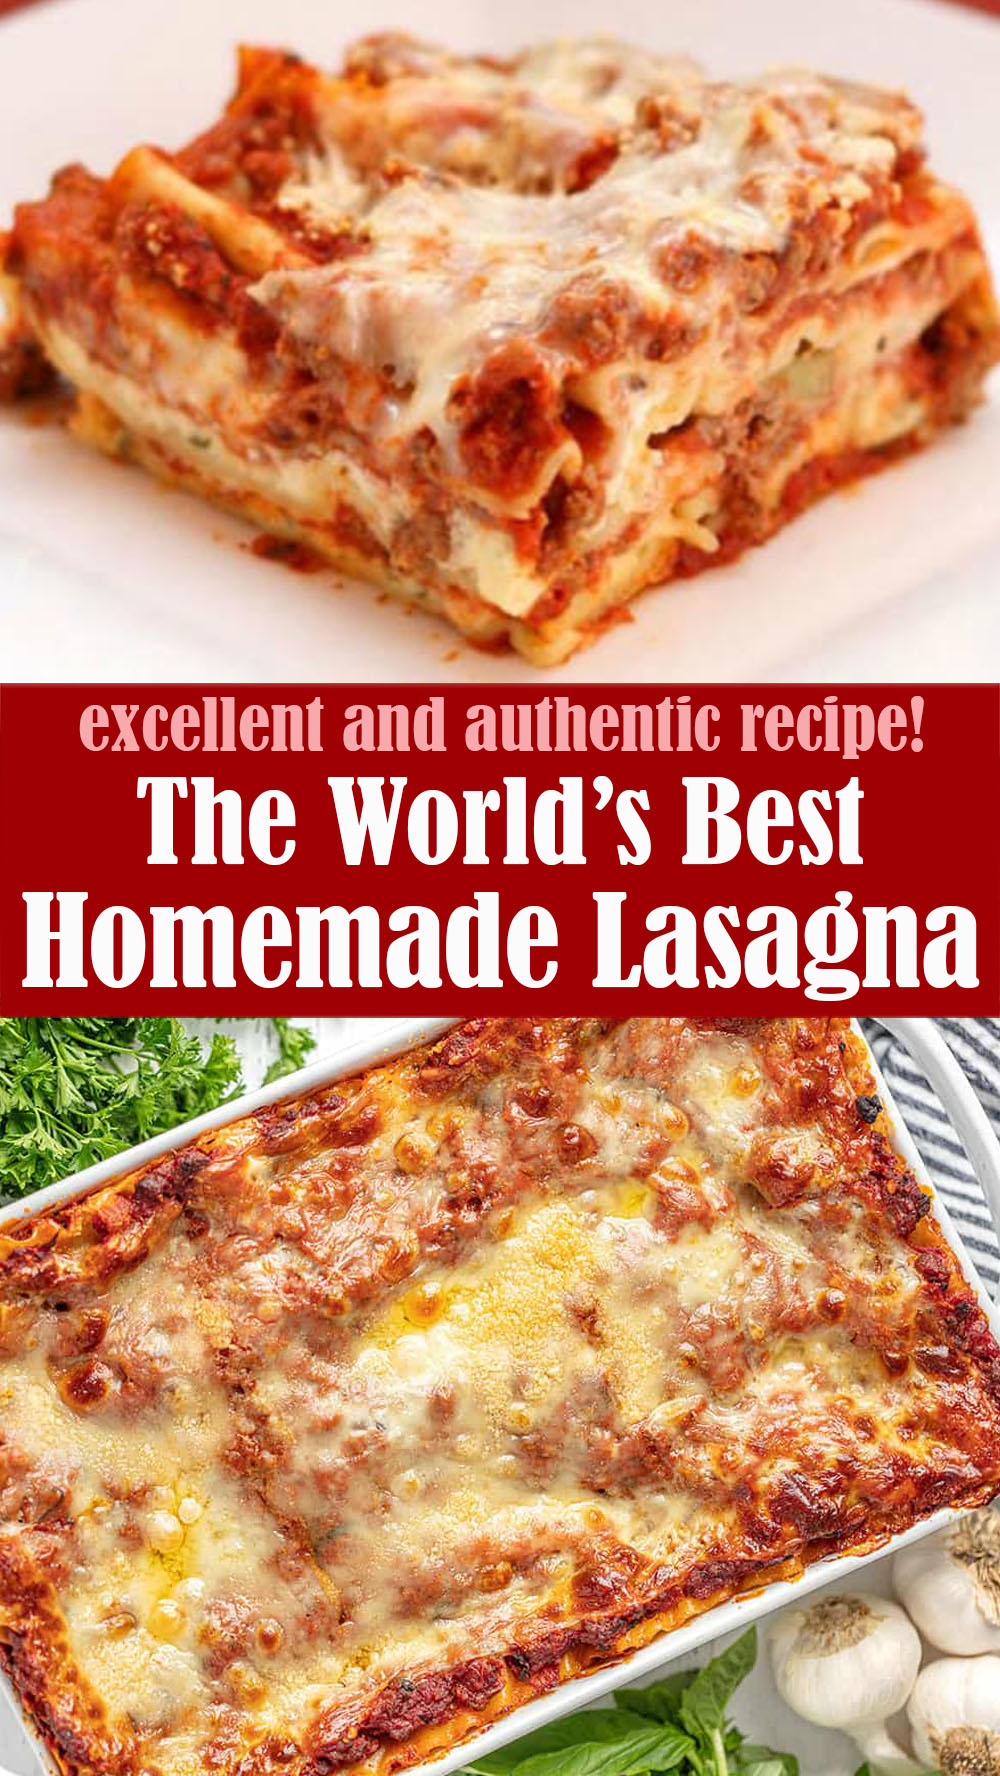 The World's Best Homemade Lasagna Recipe